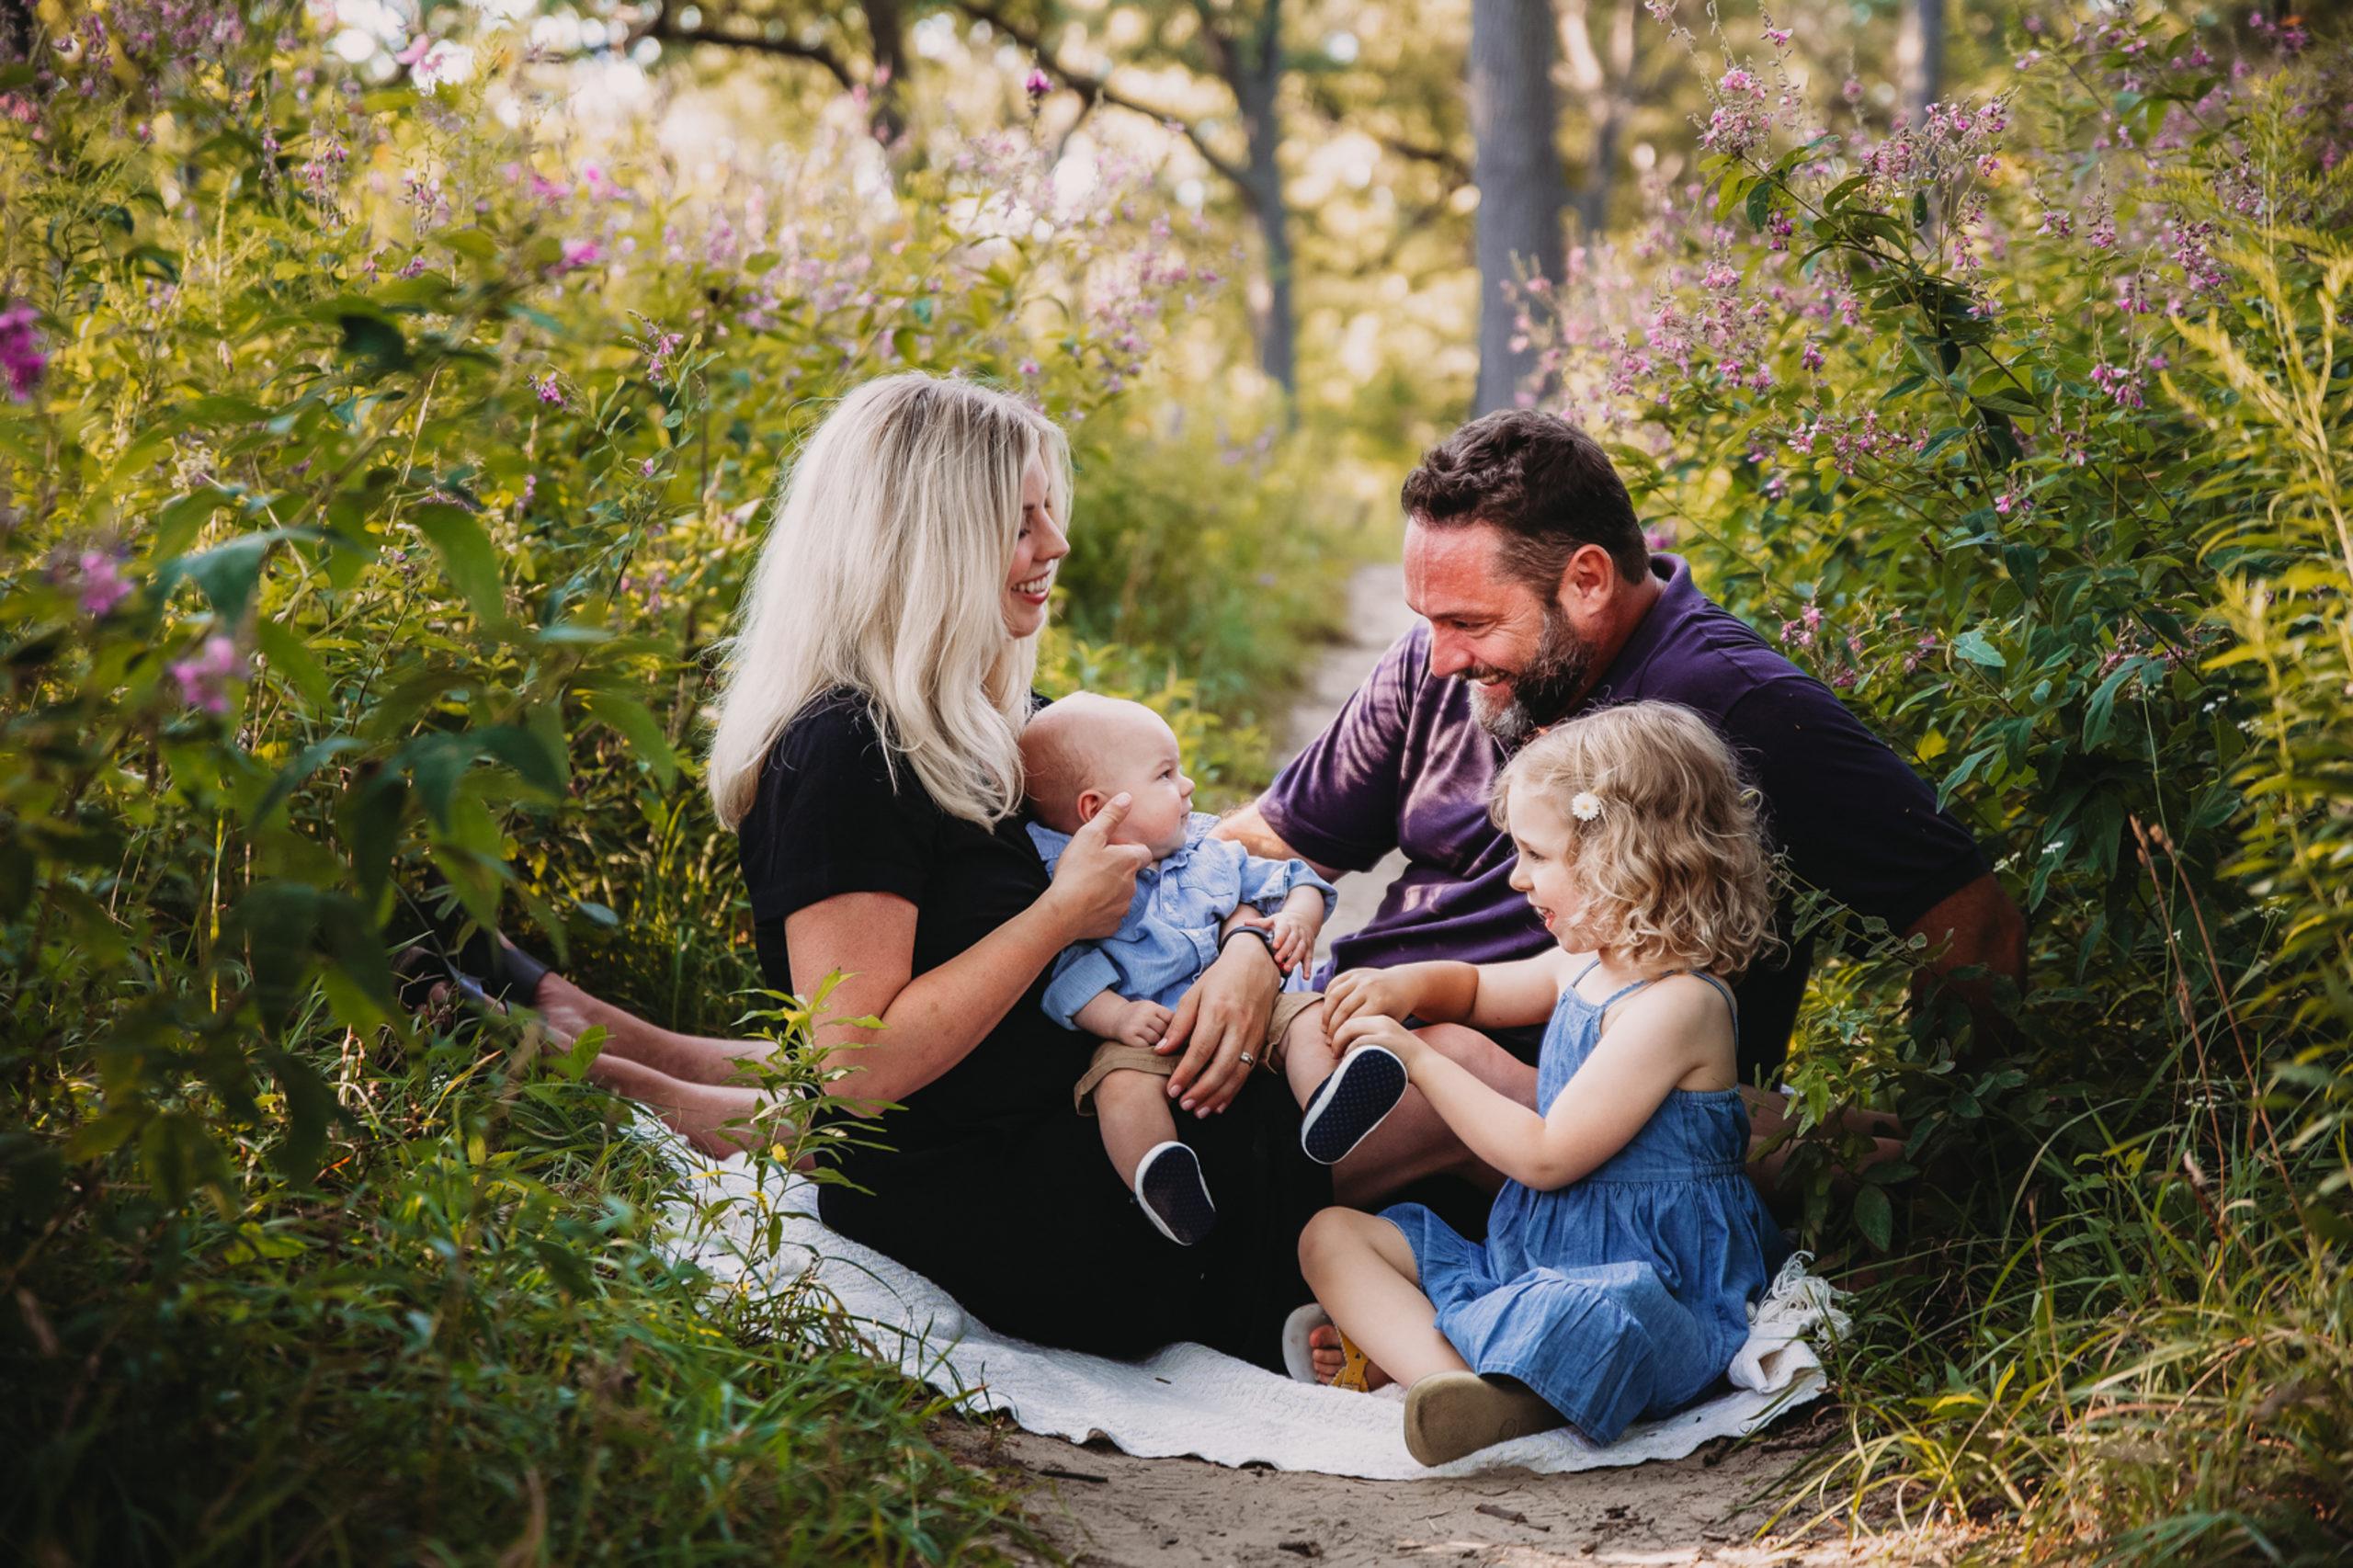 family portrait guide- family posing on blanket in forest